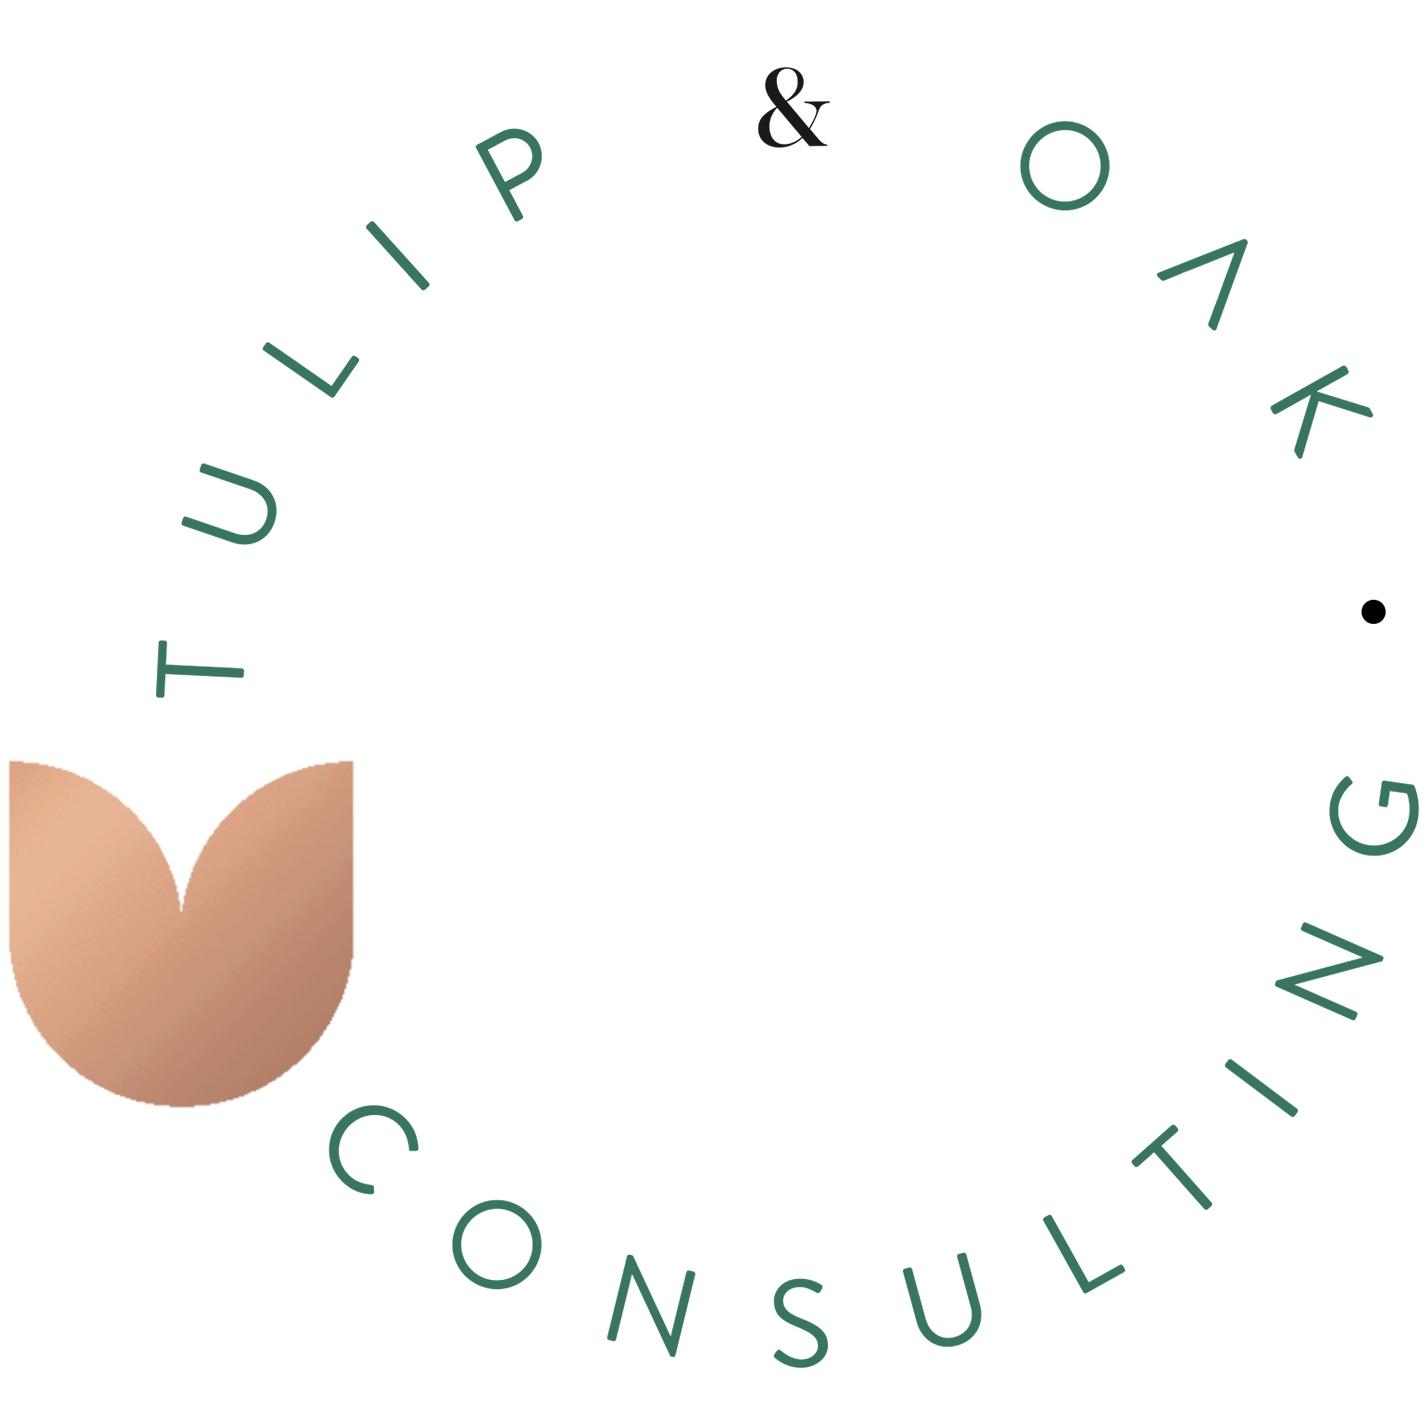 Tulip&Oak_CircleVariation_WhiteBG.jpg